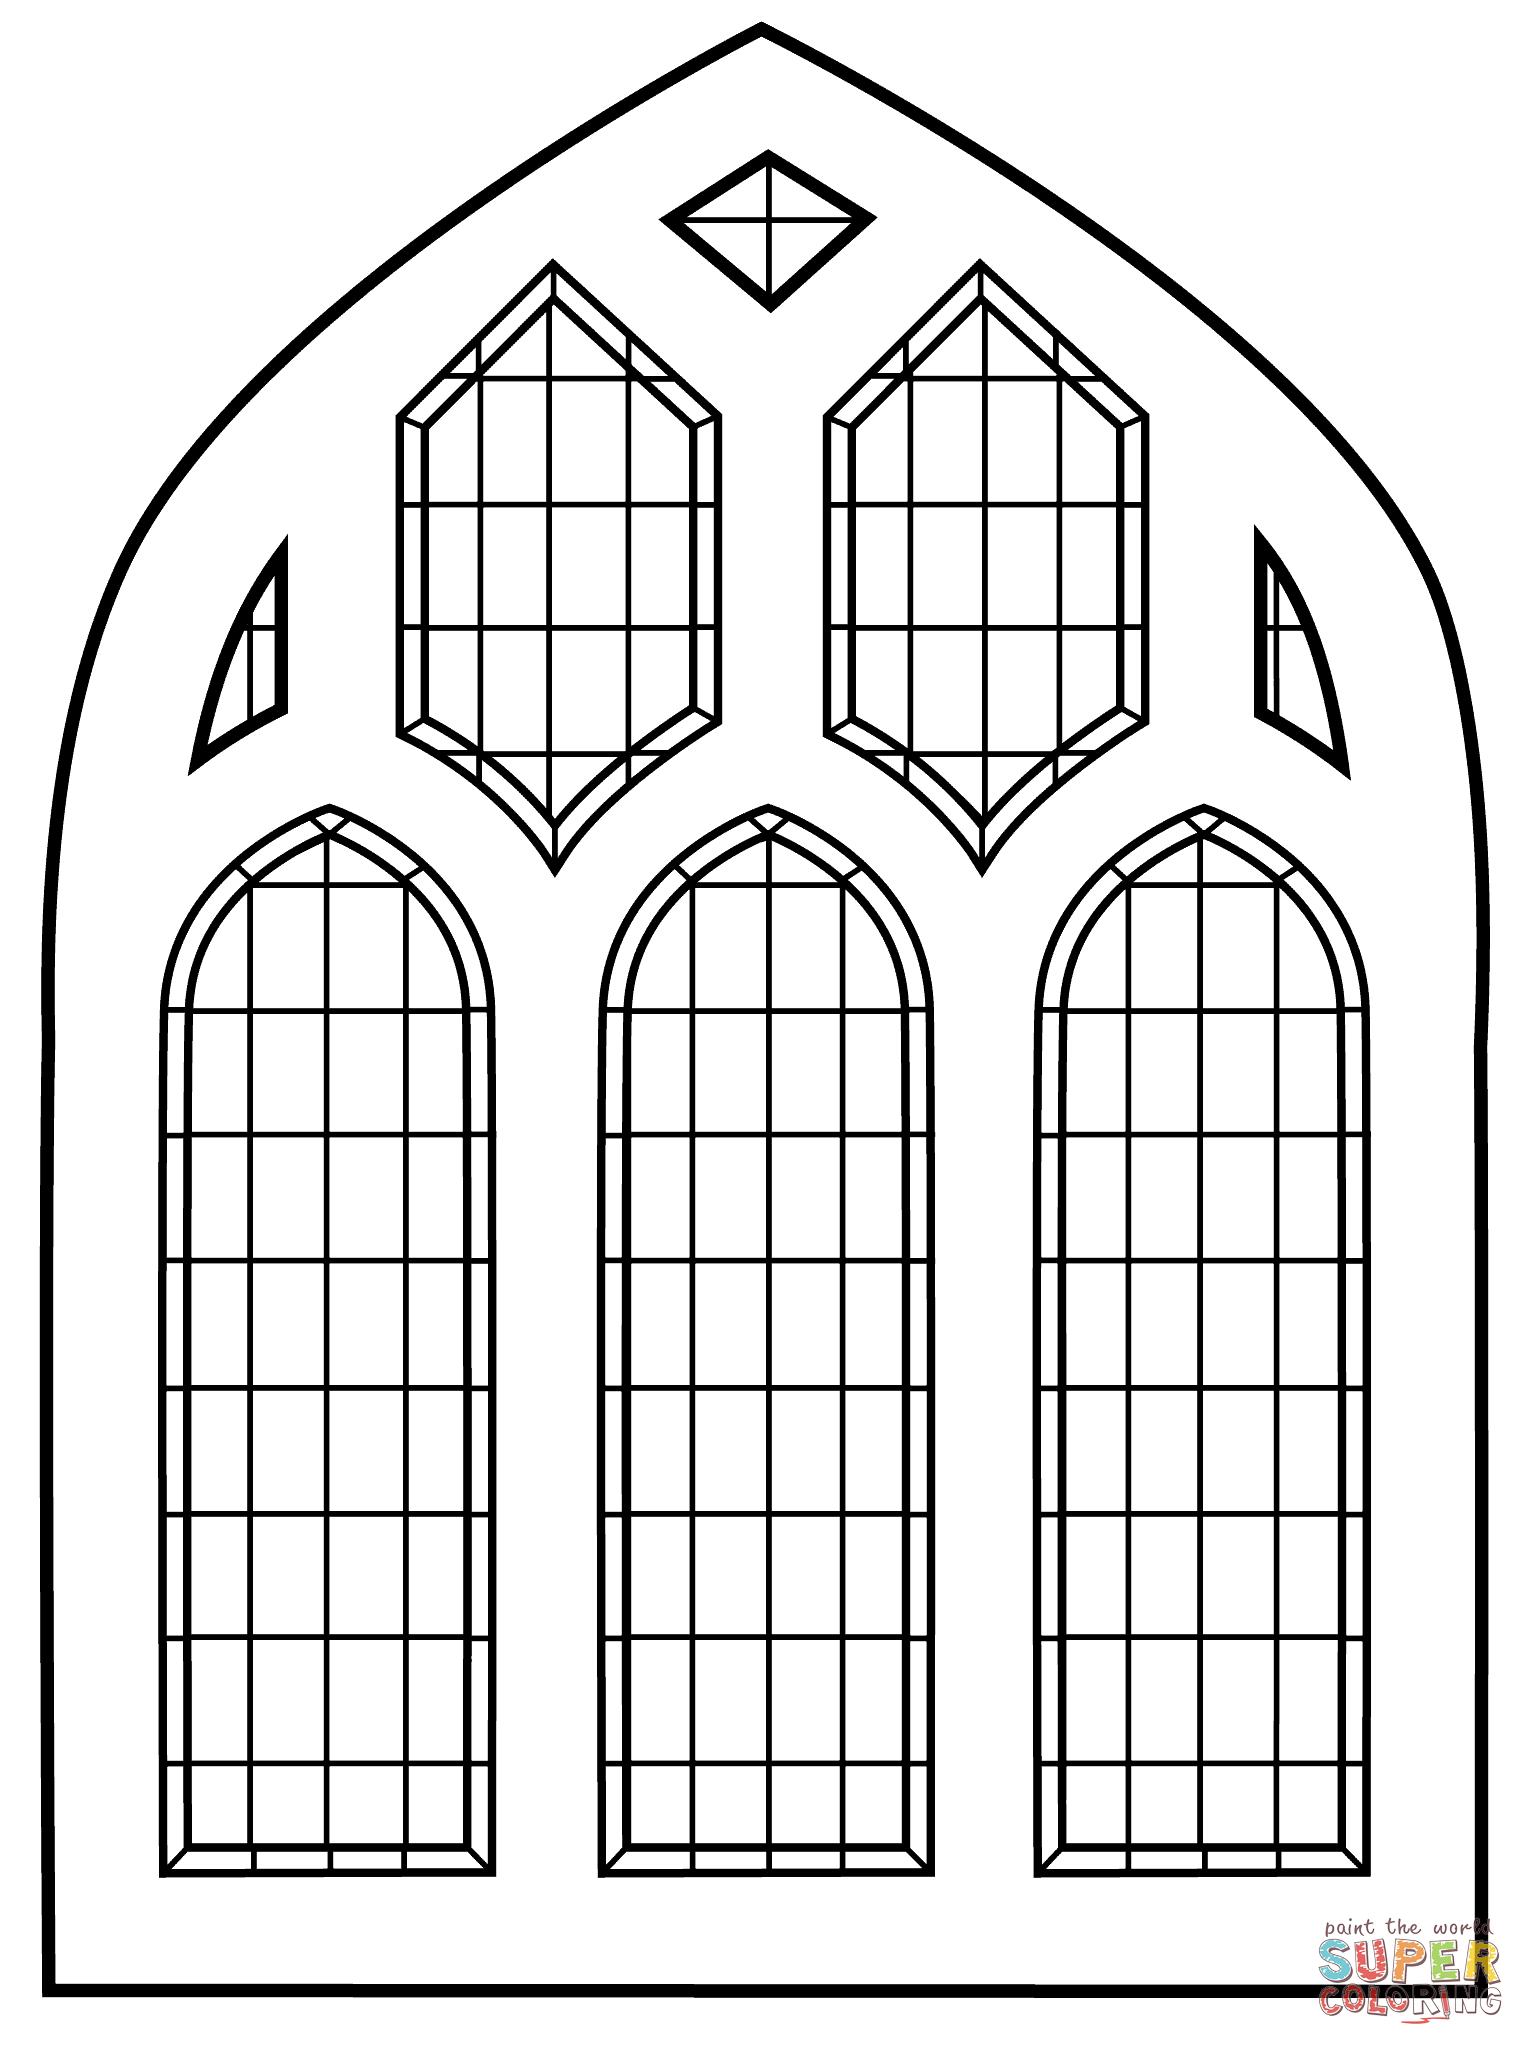 Stained Glass Window Gratis Kleurplaten Mandala Kleurplaten Kleurplaten